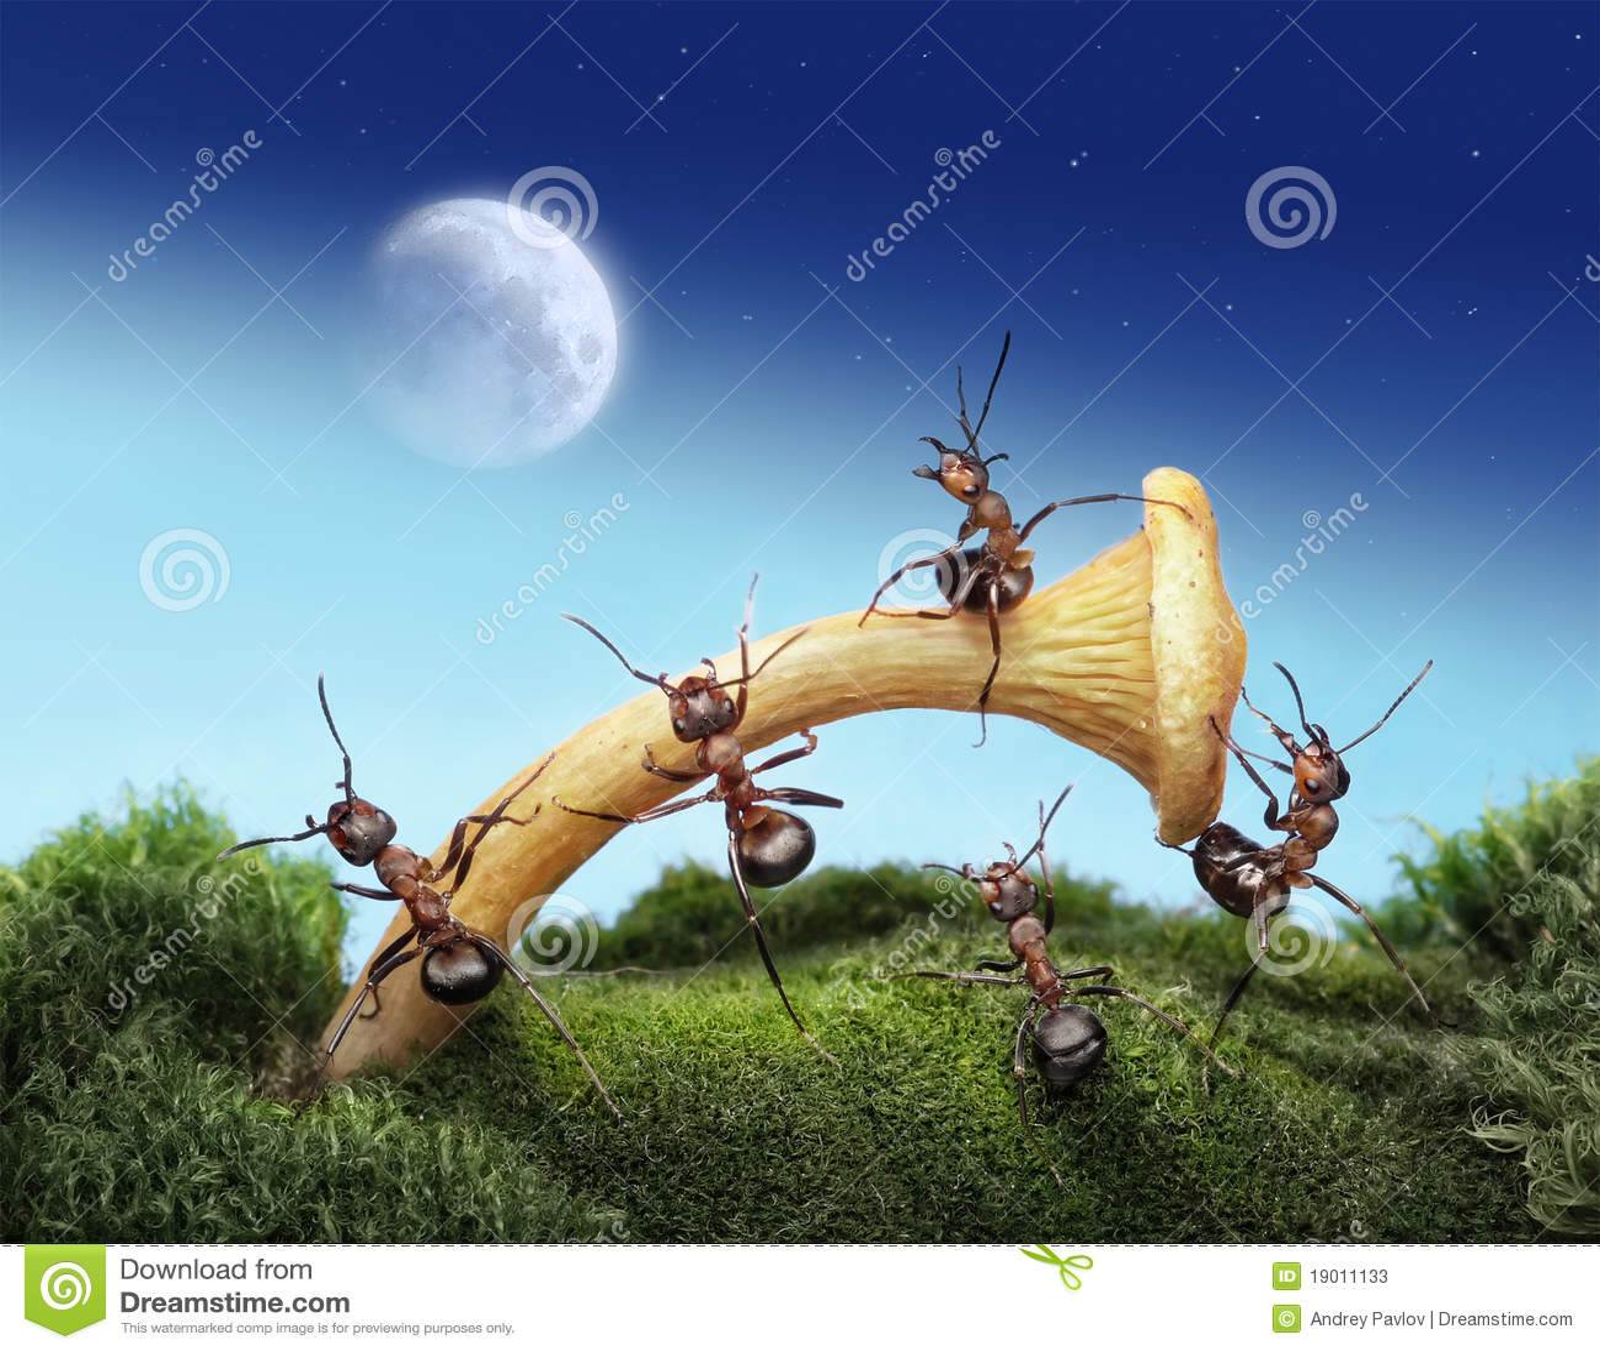 Myralanseringar moon spacemanlaget till